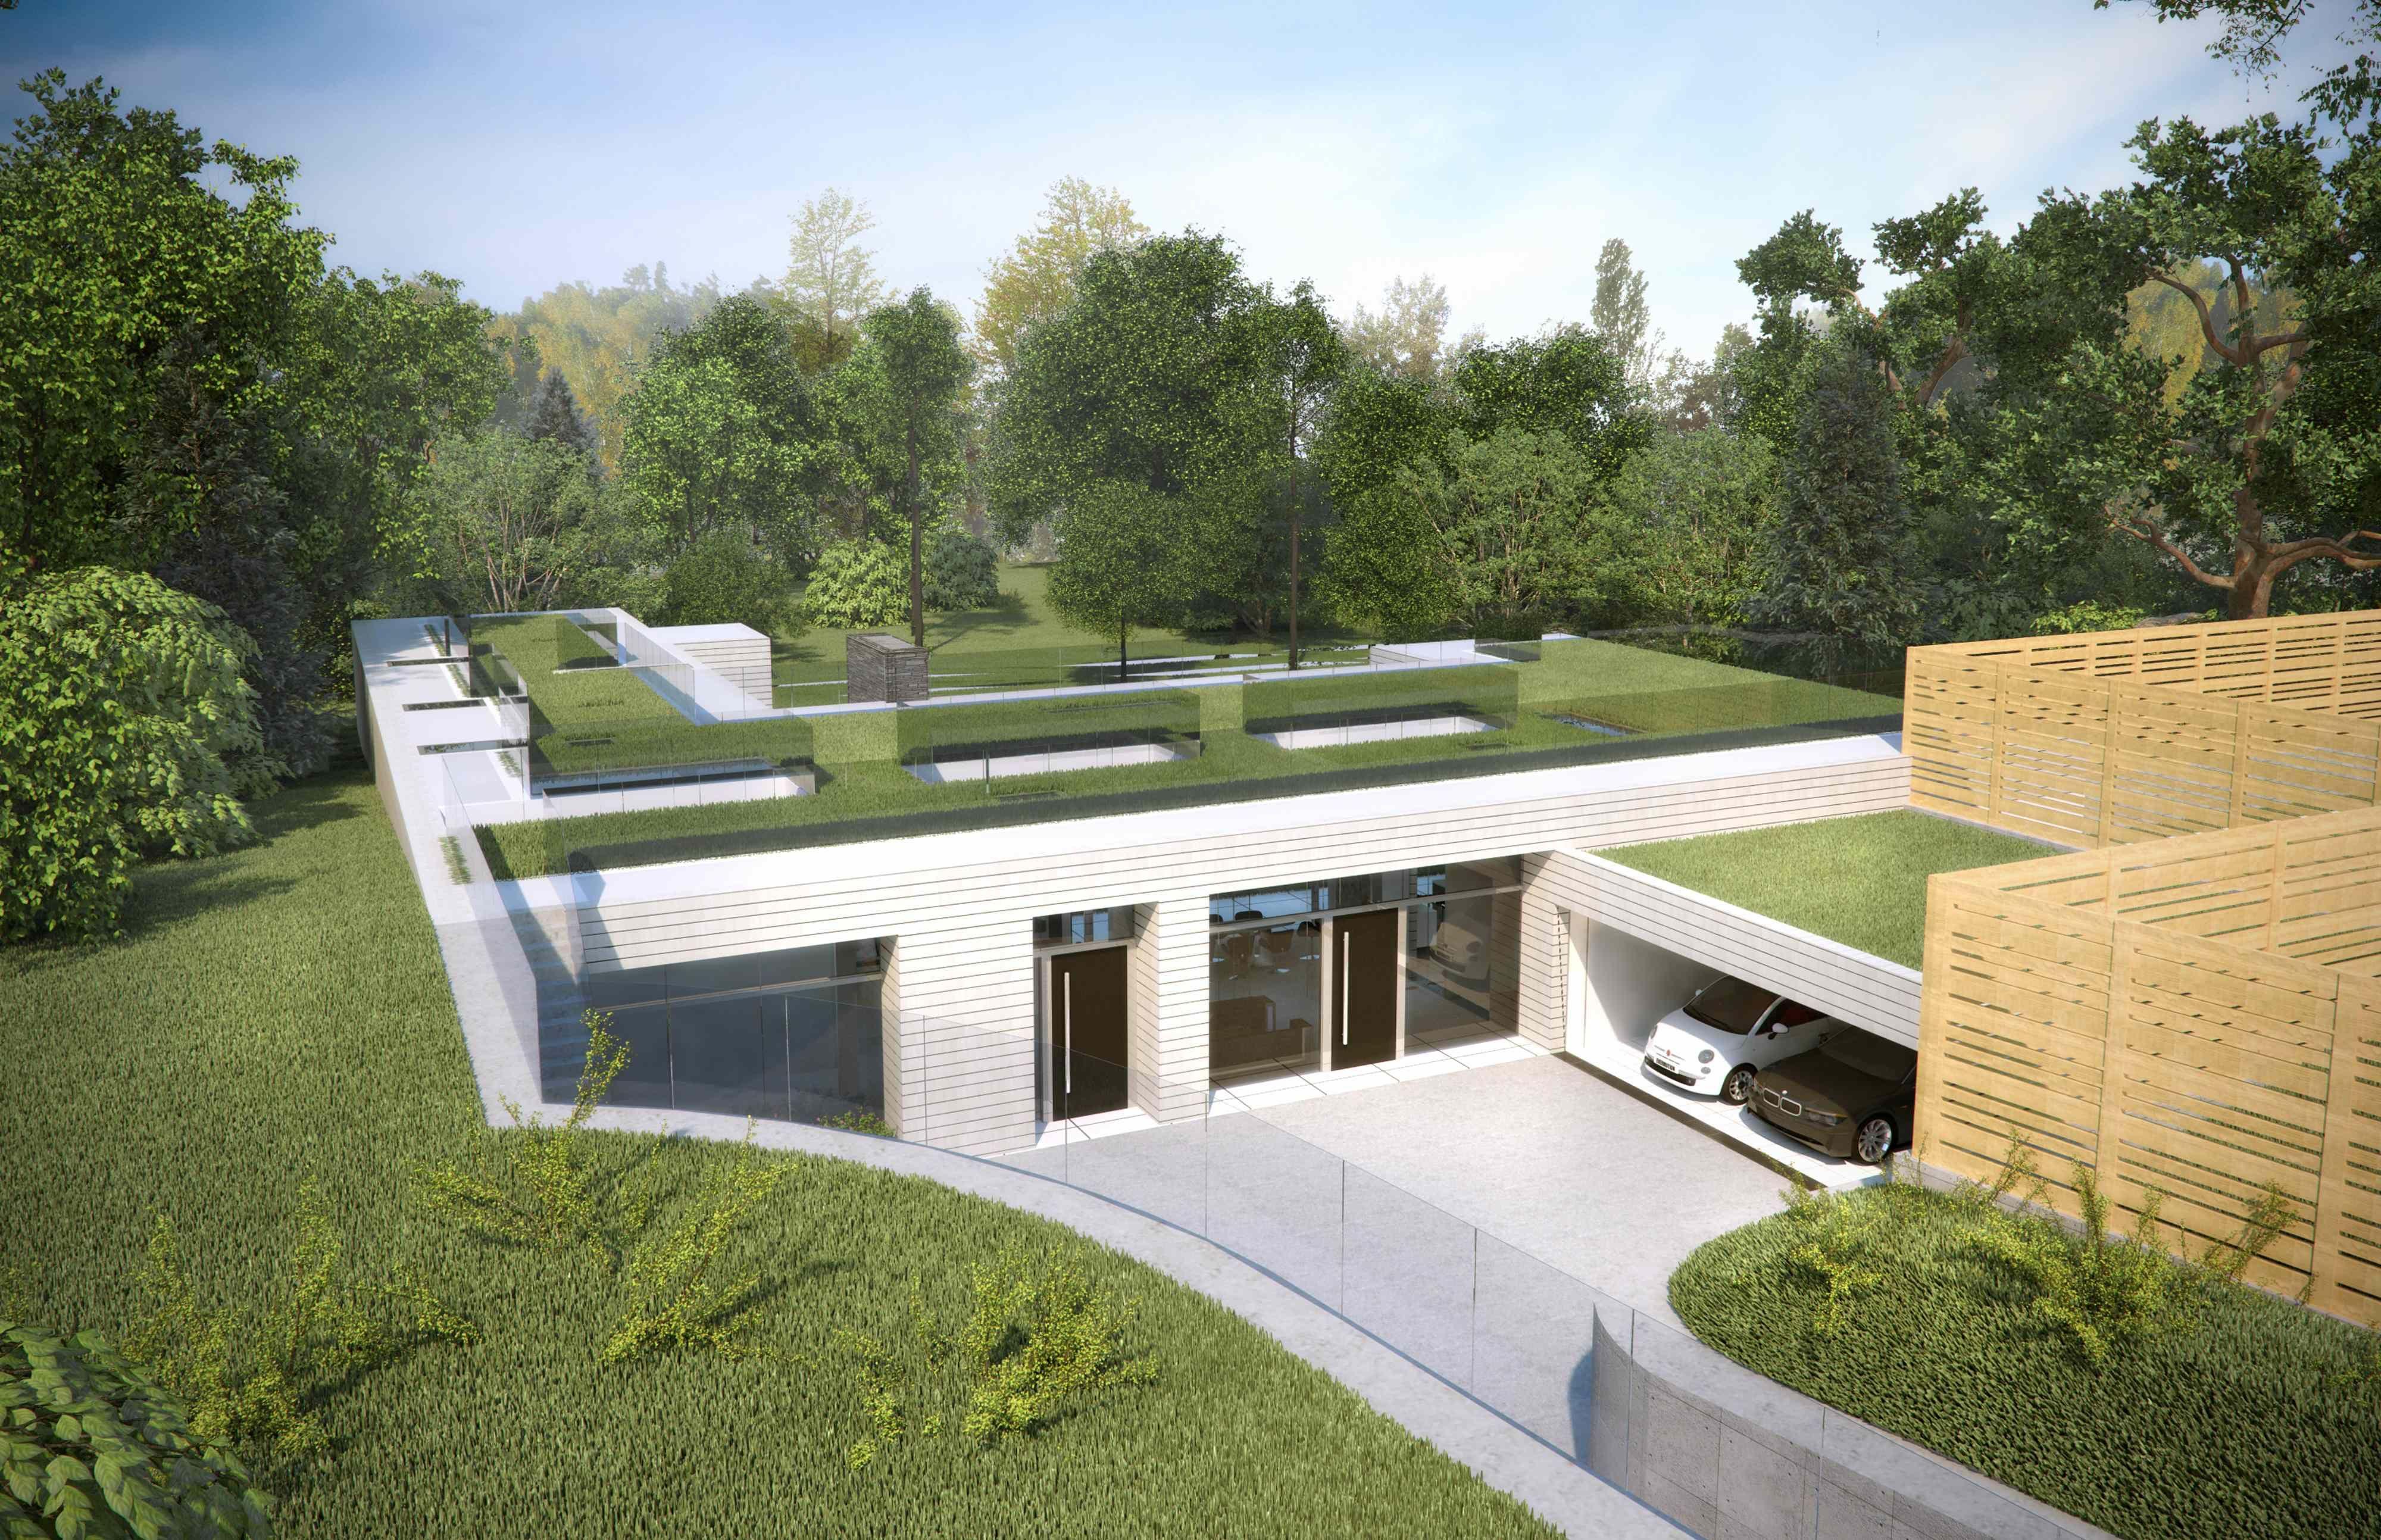 Sunken house nicolas tye architects grand design for Grand designs modern house